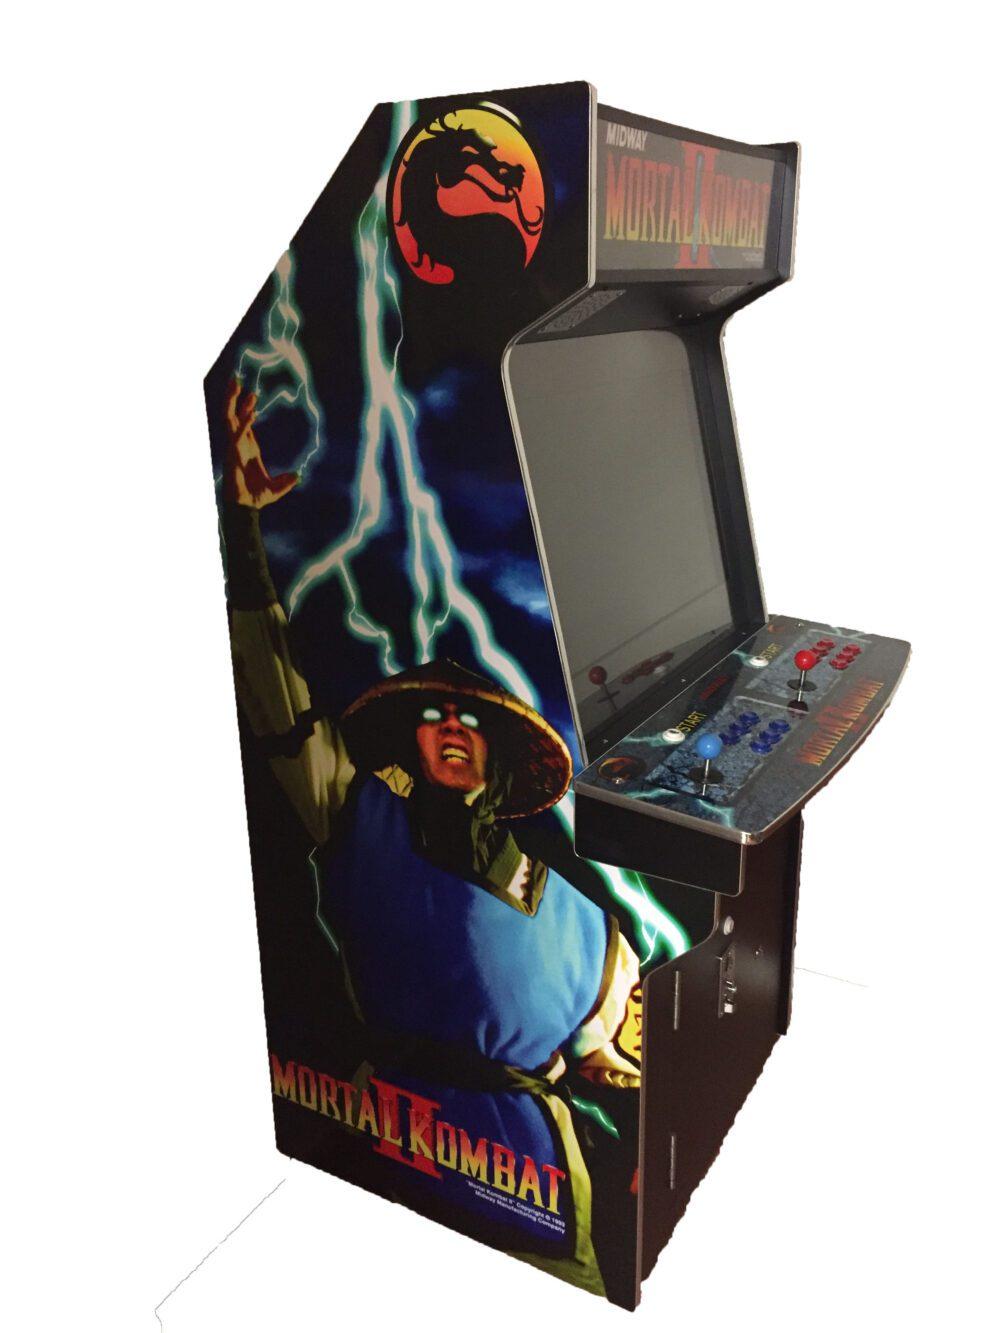 Upright Arcade Machine Mortal Kombat 2 for sale